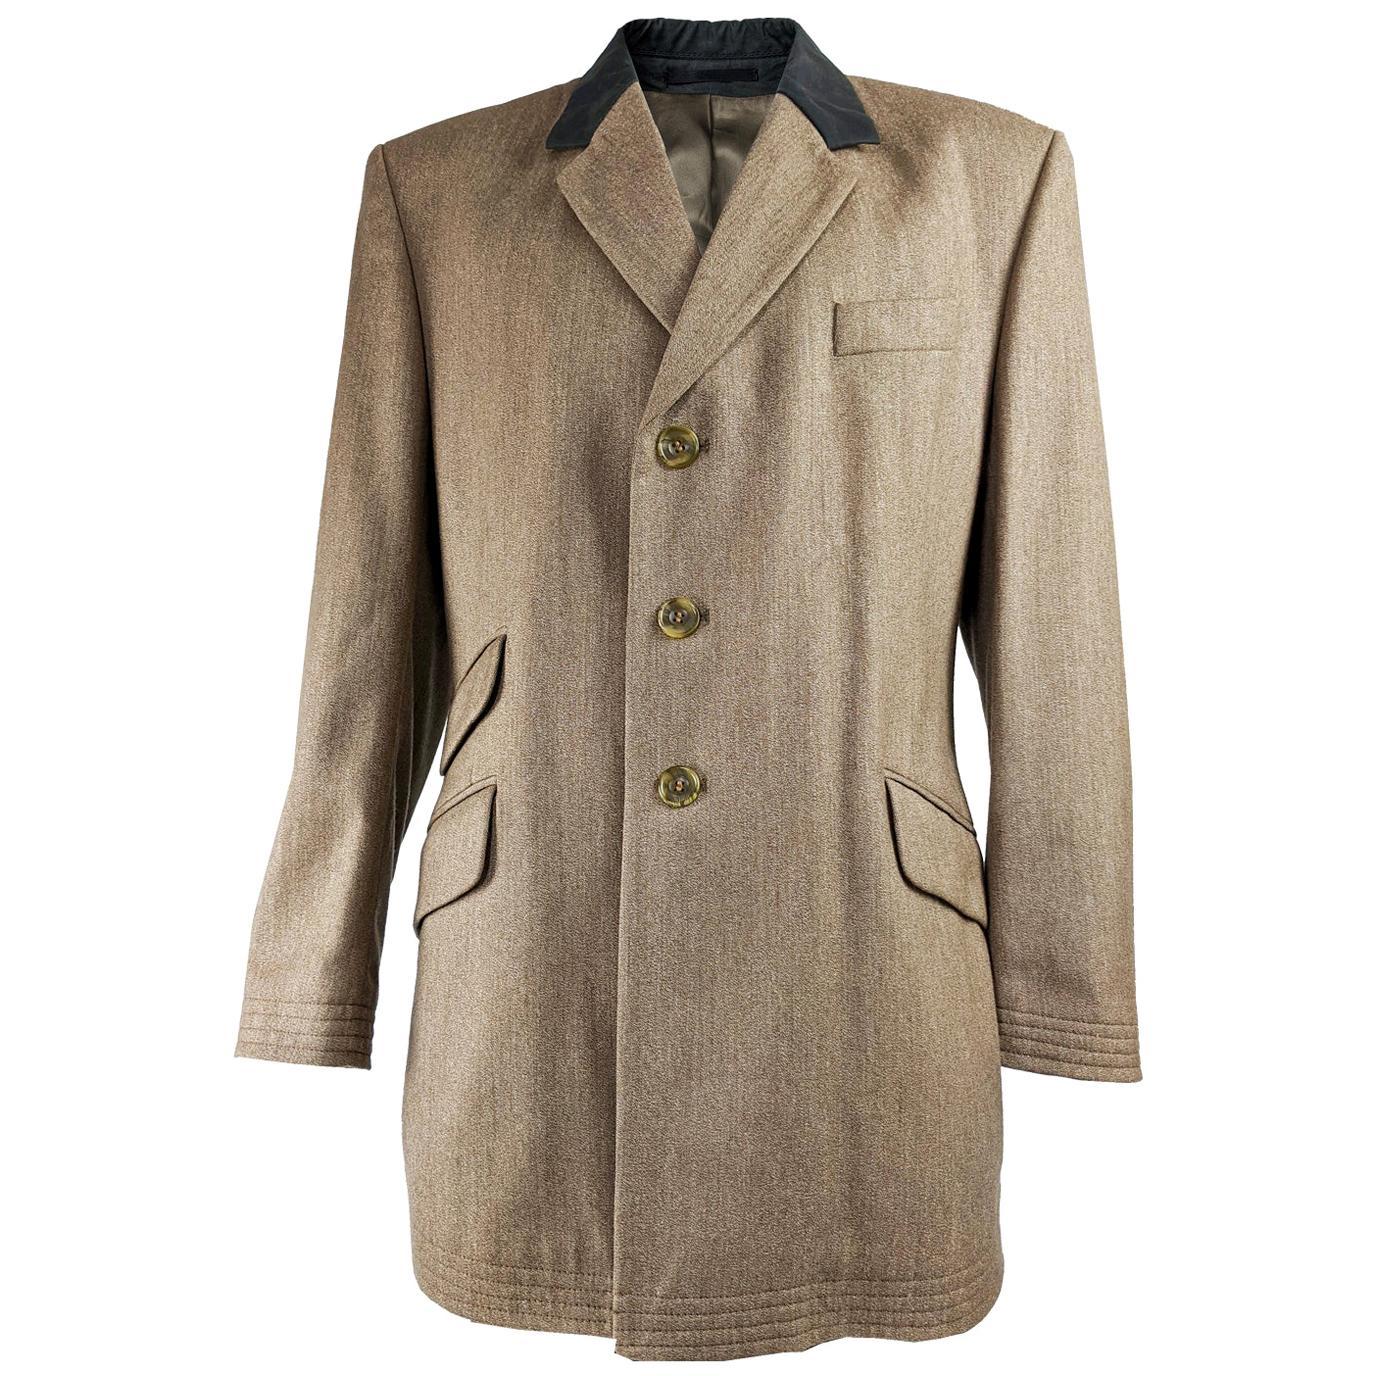 Joseph Homme Mens Vintage Chesterfield Coat